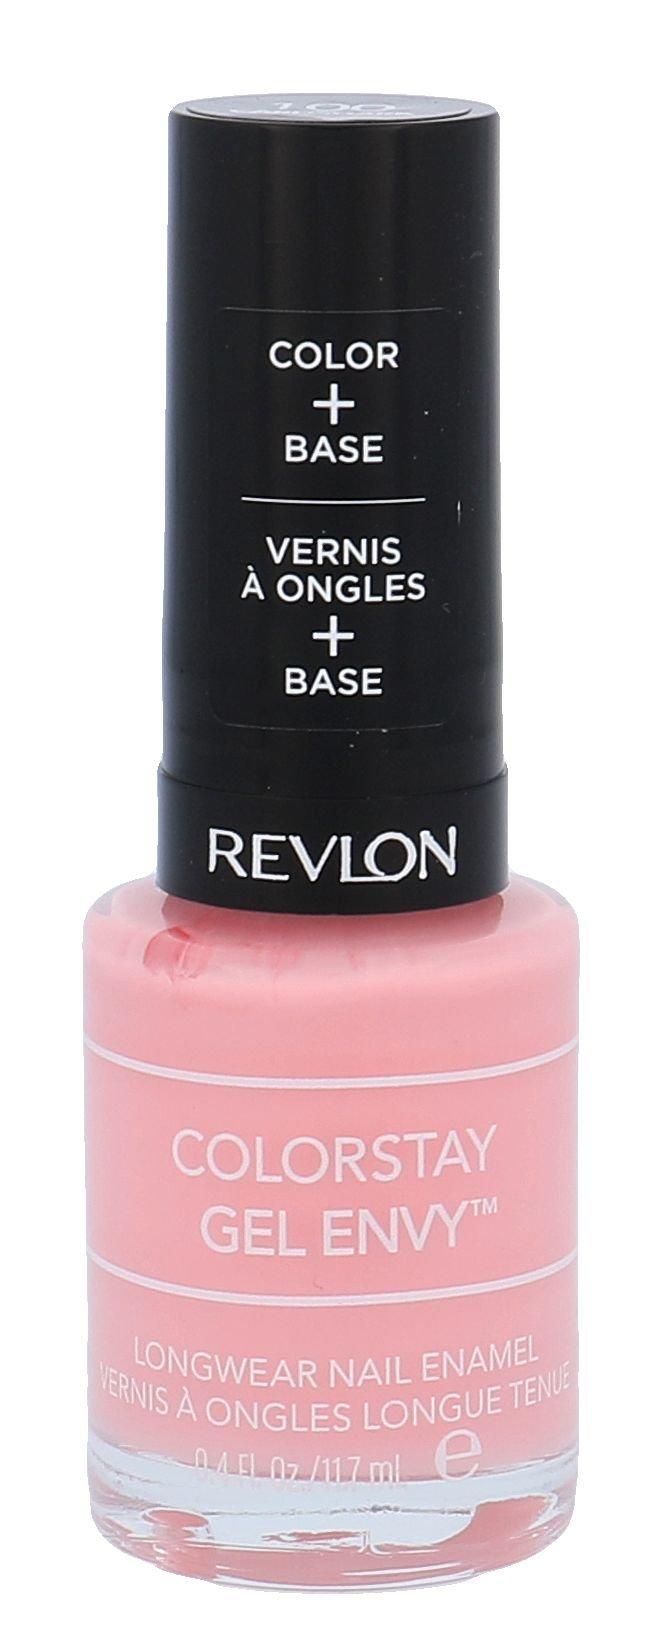 Revlon Colorstay Cosmetic 11,7ml 100 Cardshark